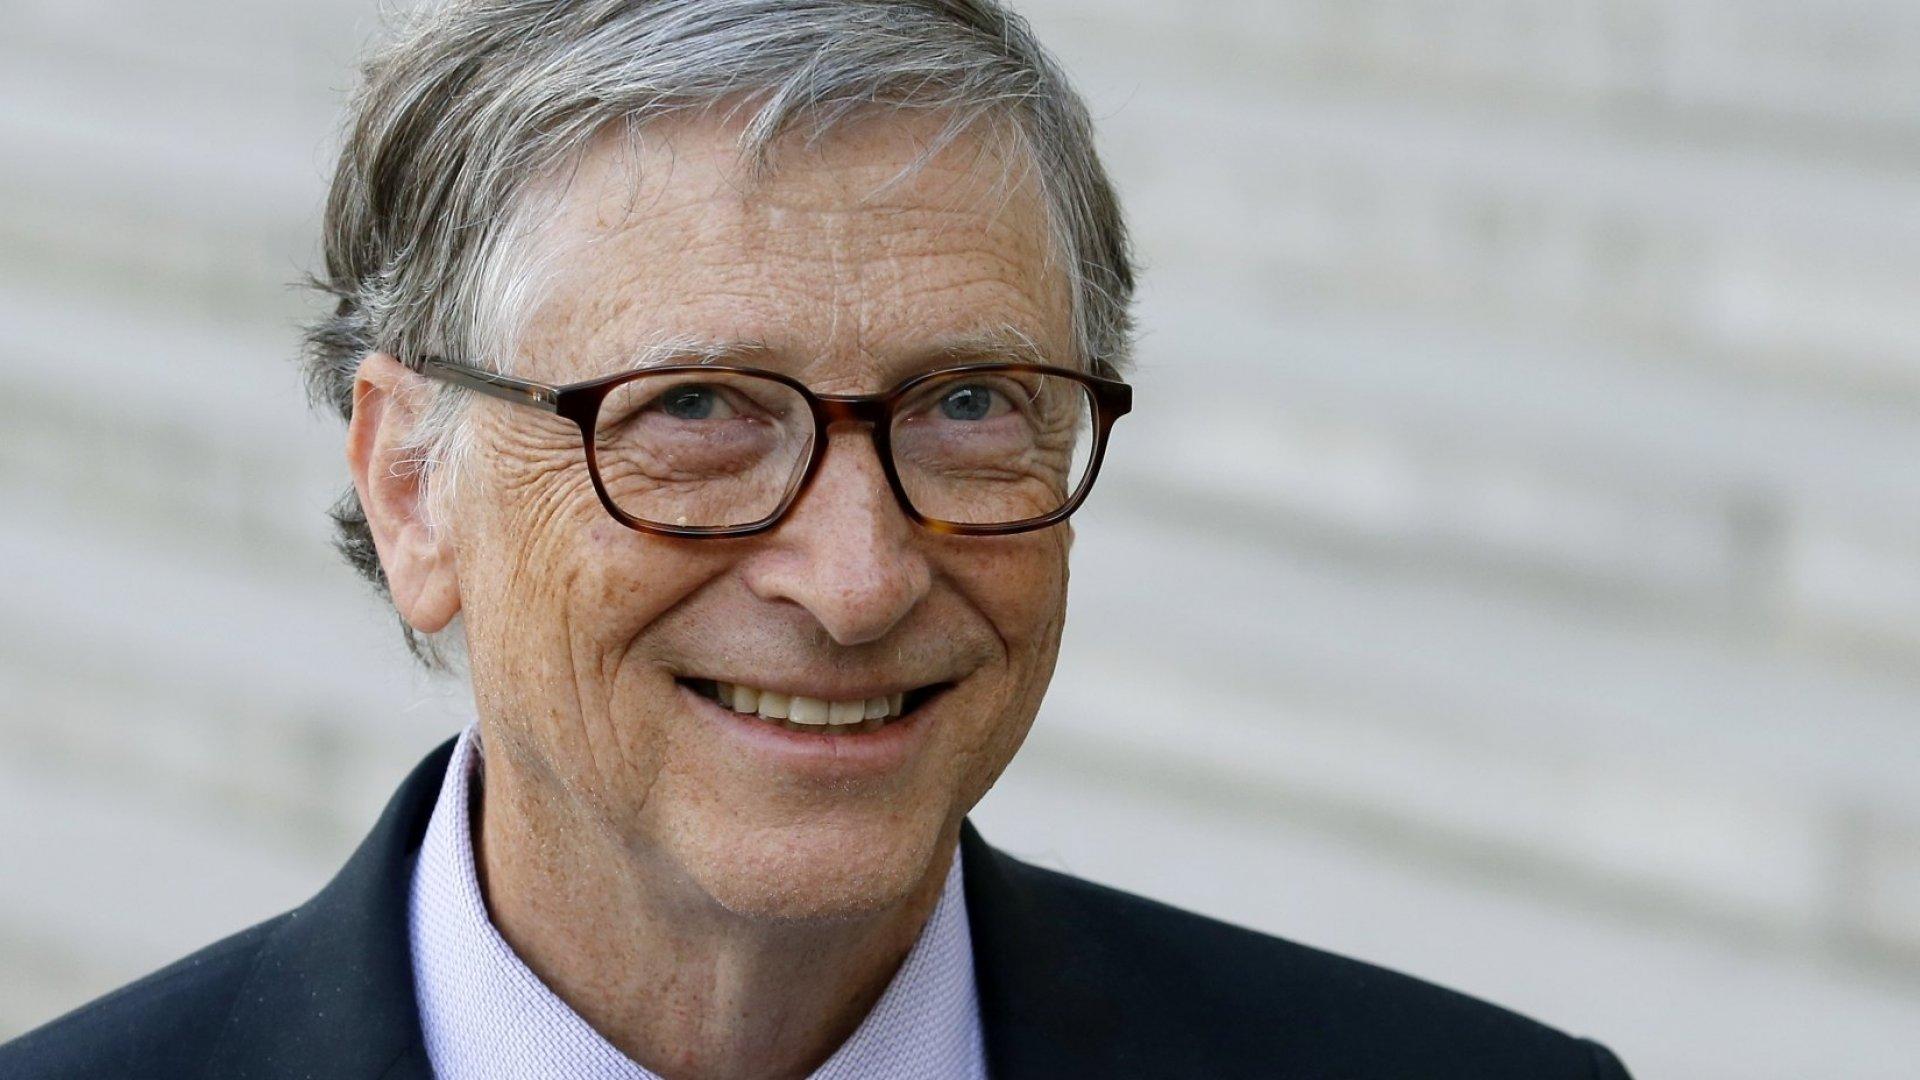 Bill Gates has shared his new summer reading list.